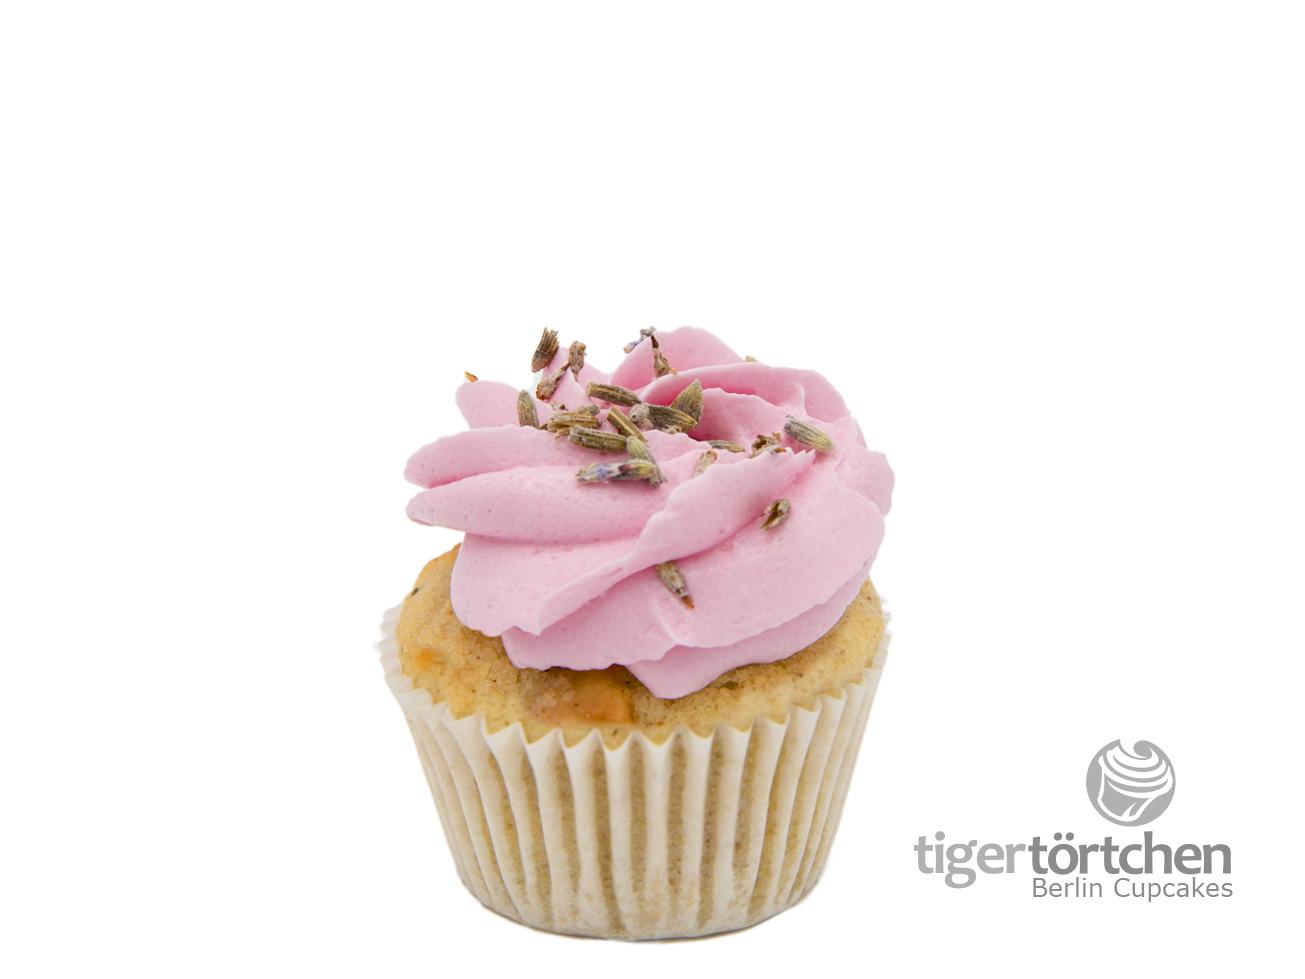 Fruchtiger Apfel Cupcake & Lavendel Creme